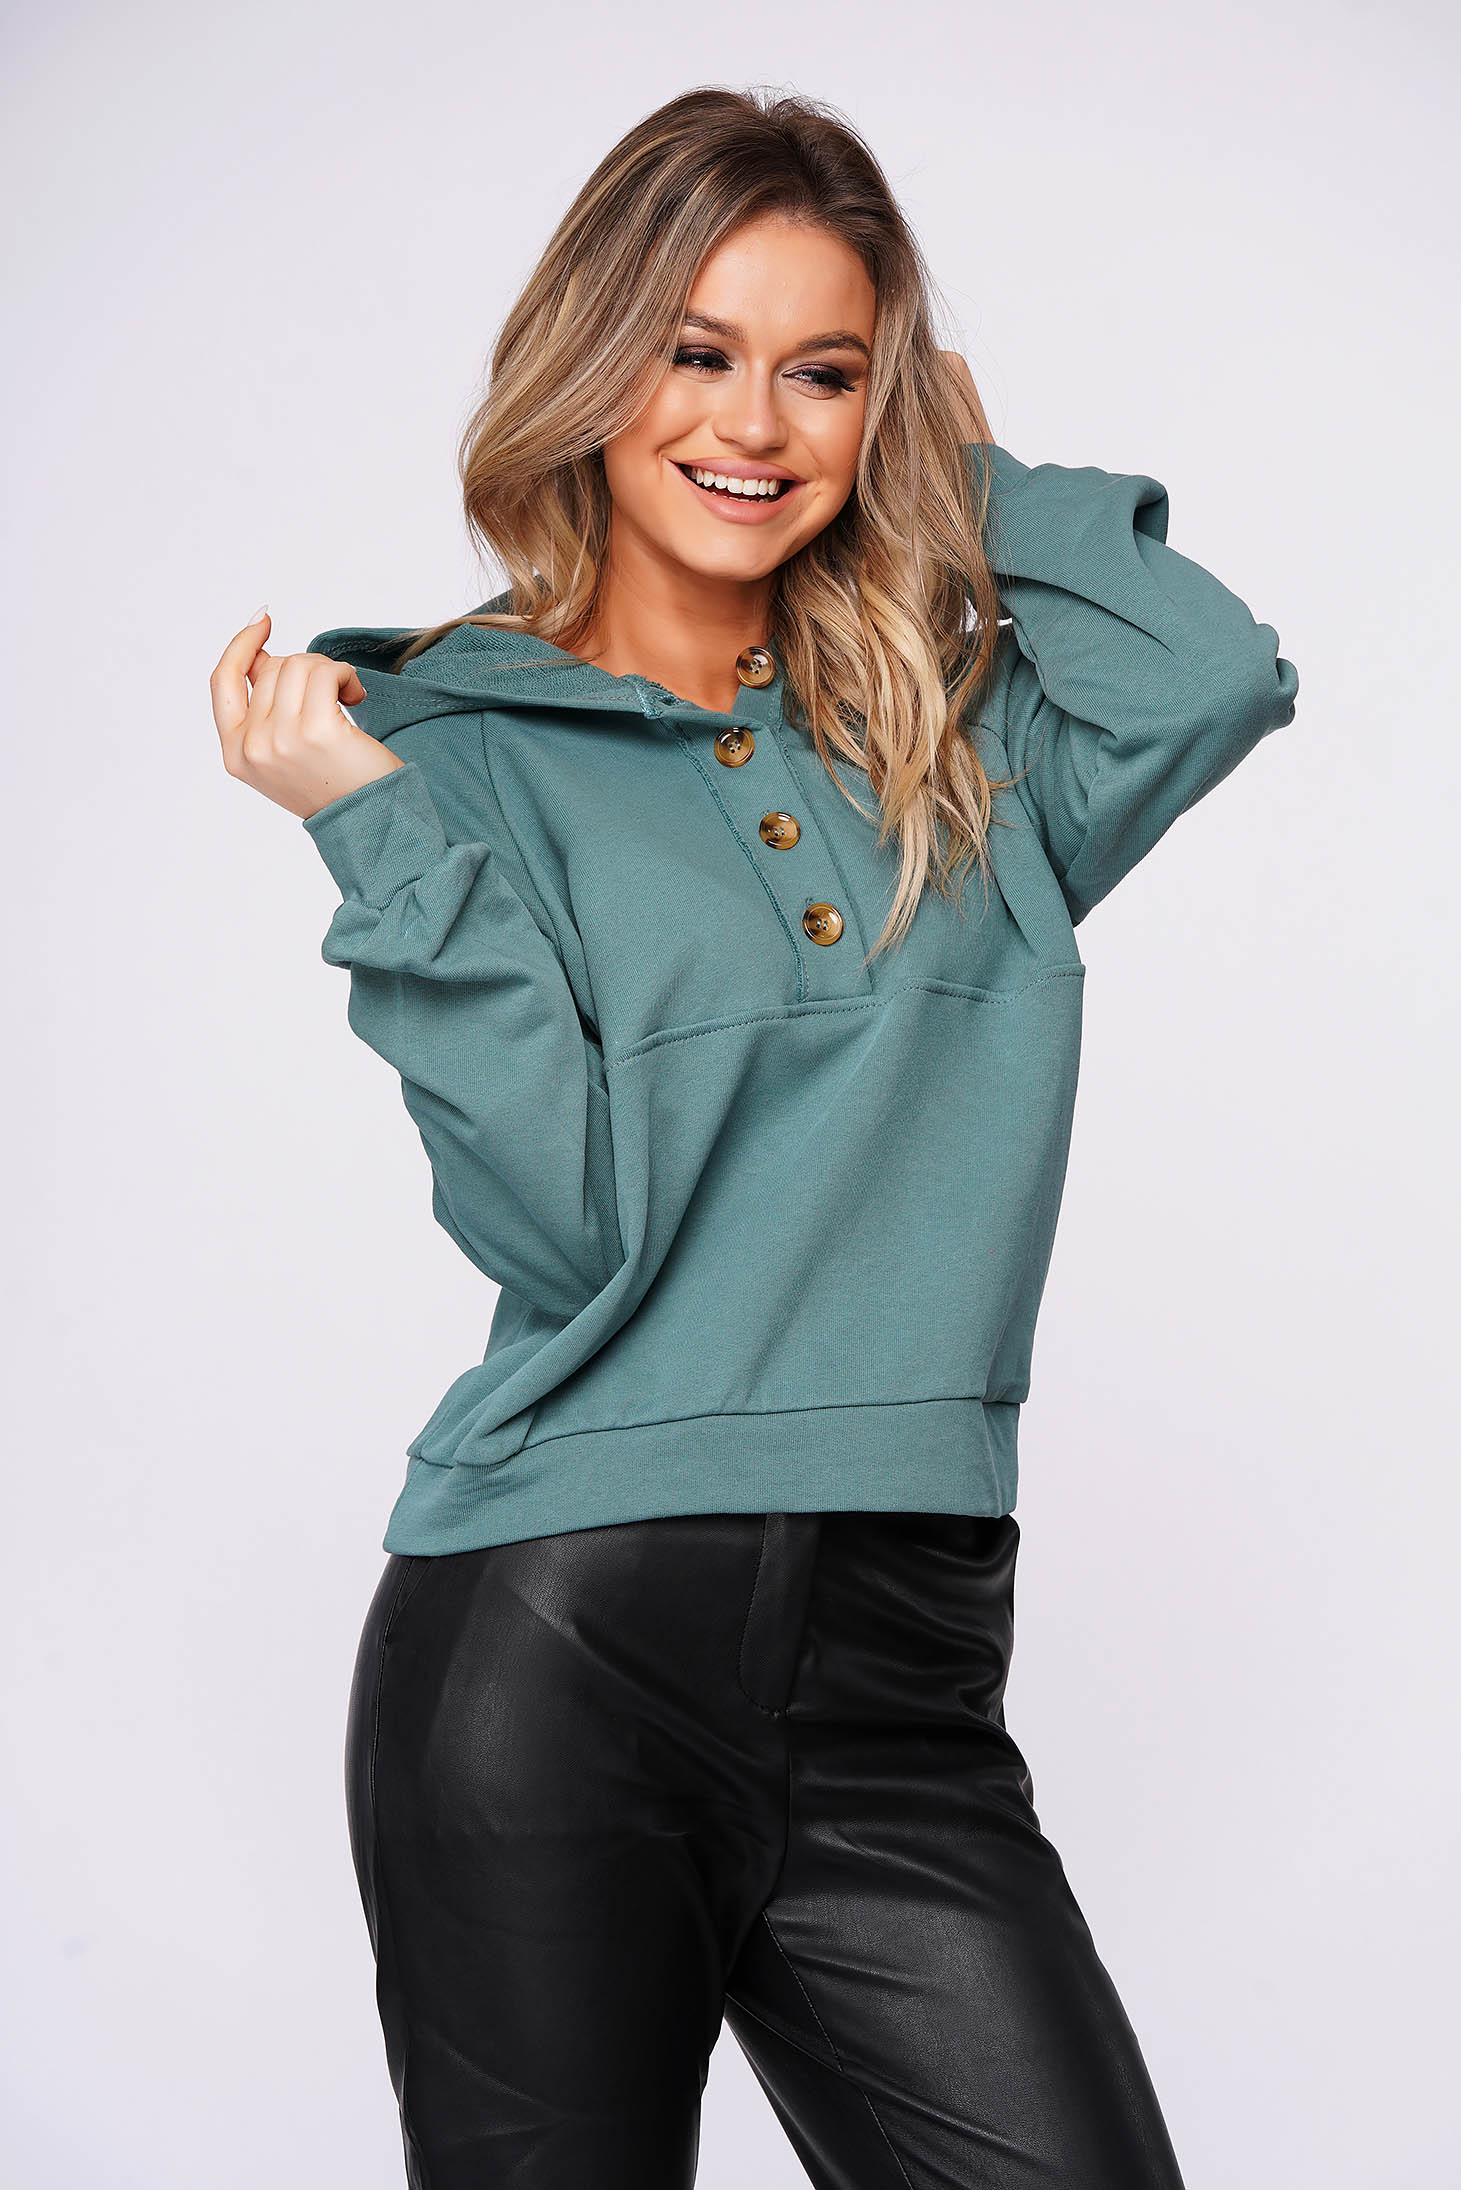 Bluza dama SunShine din bumbac usor elastic verde casual scurta cu croi larg